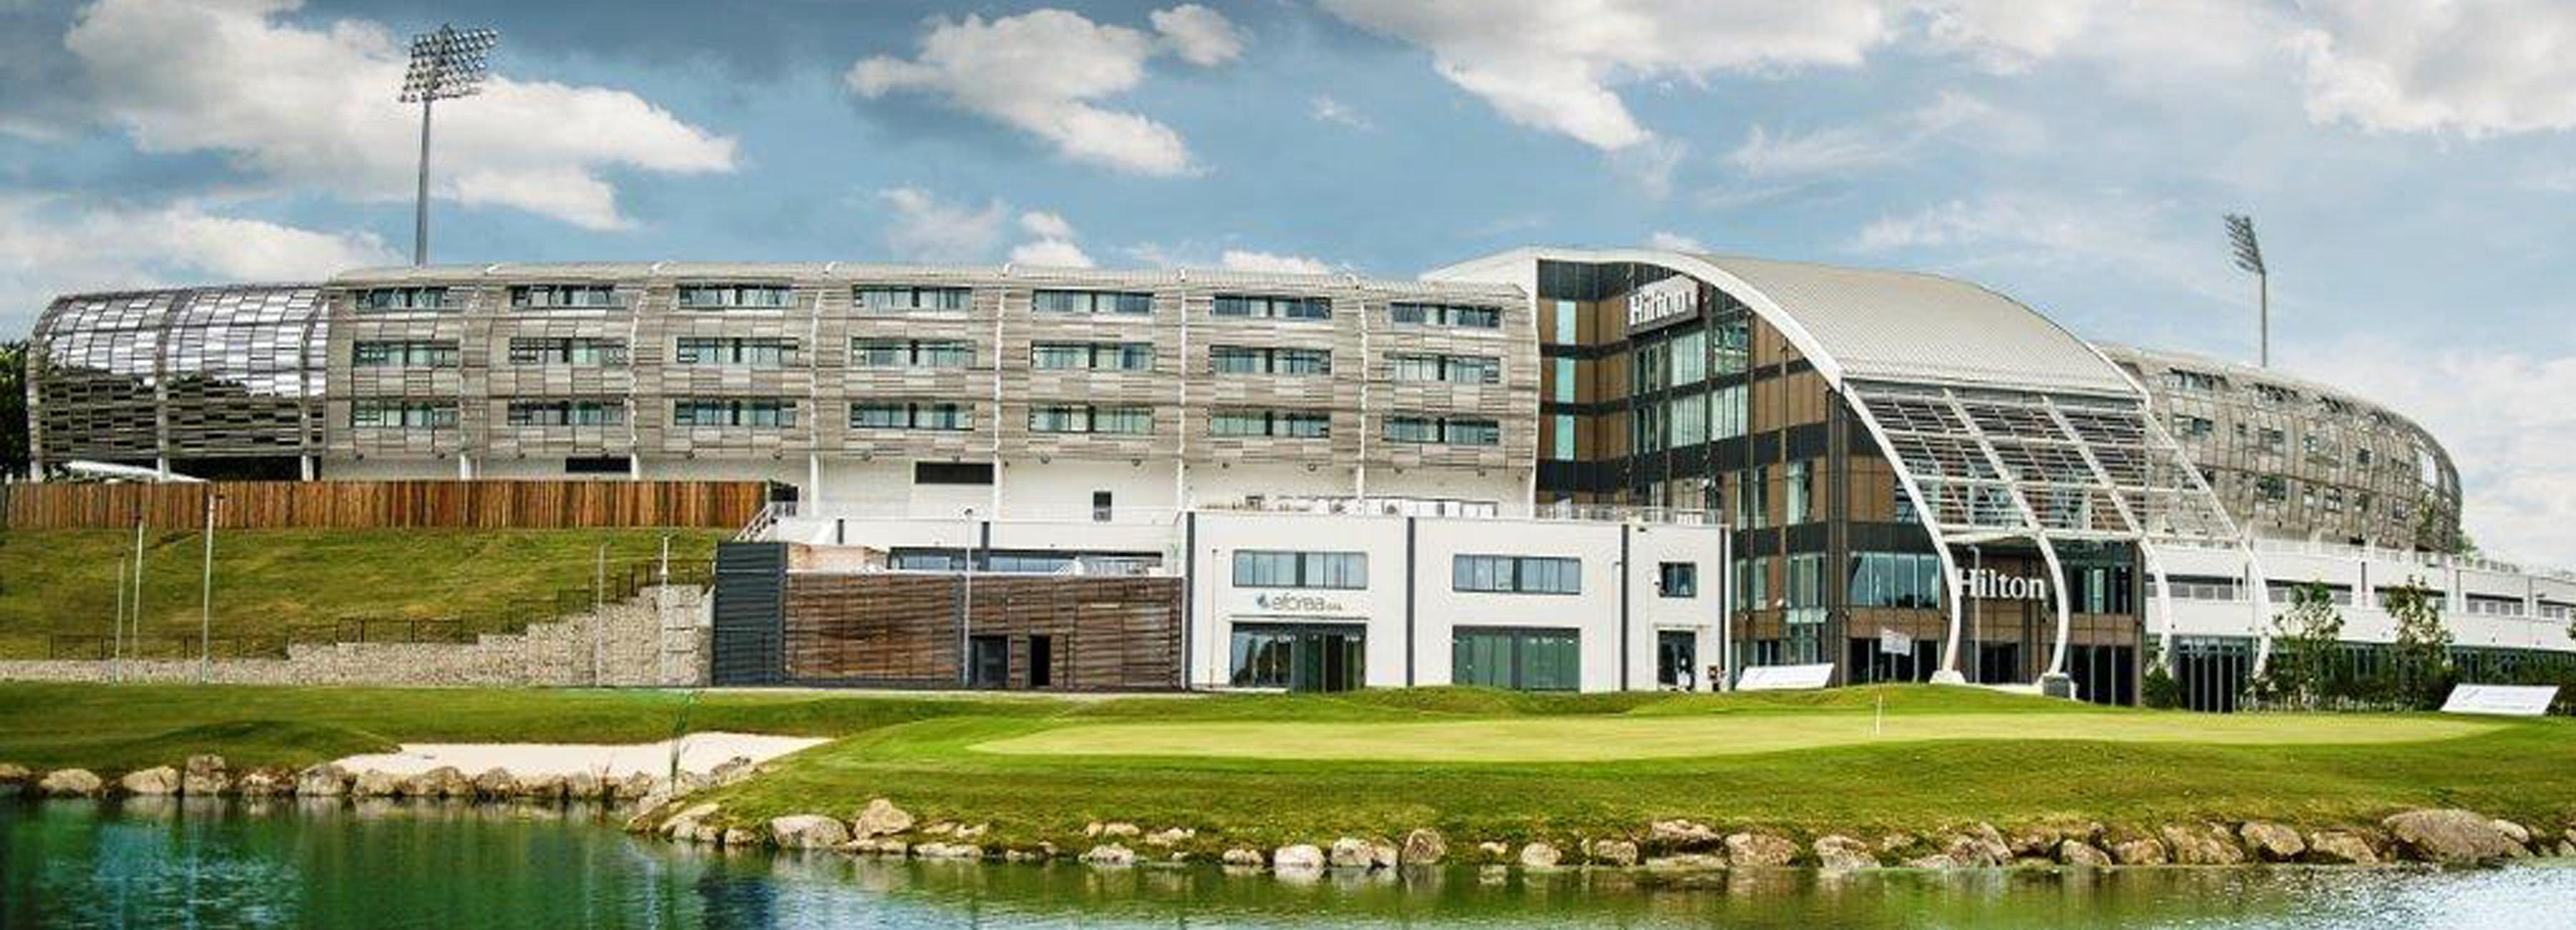 Elite international sports golf academy